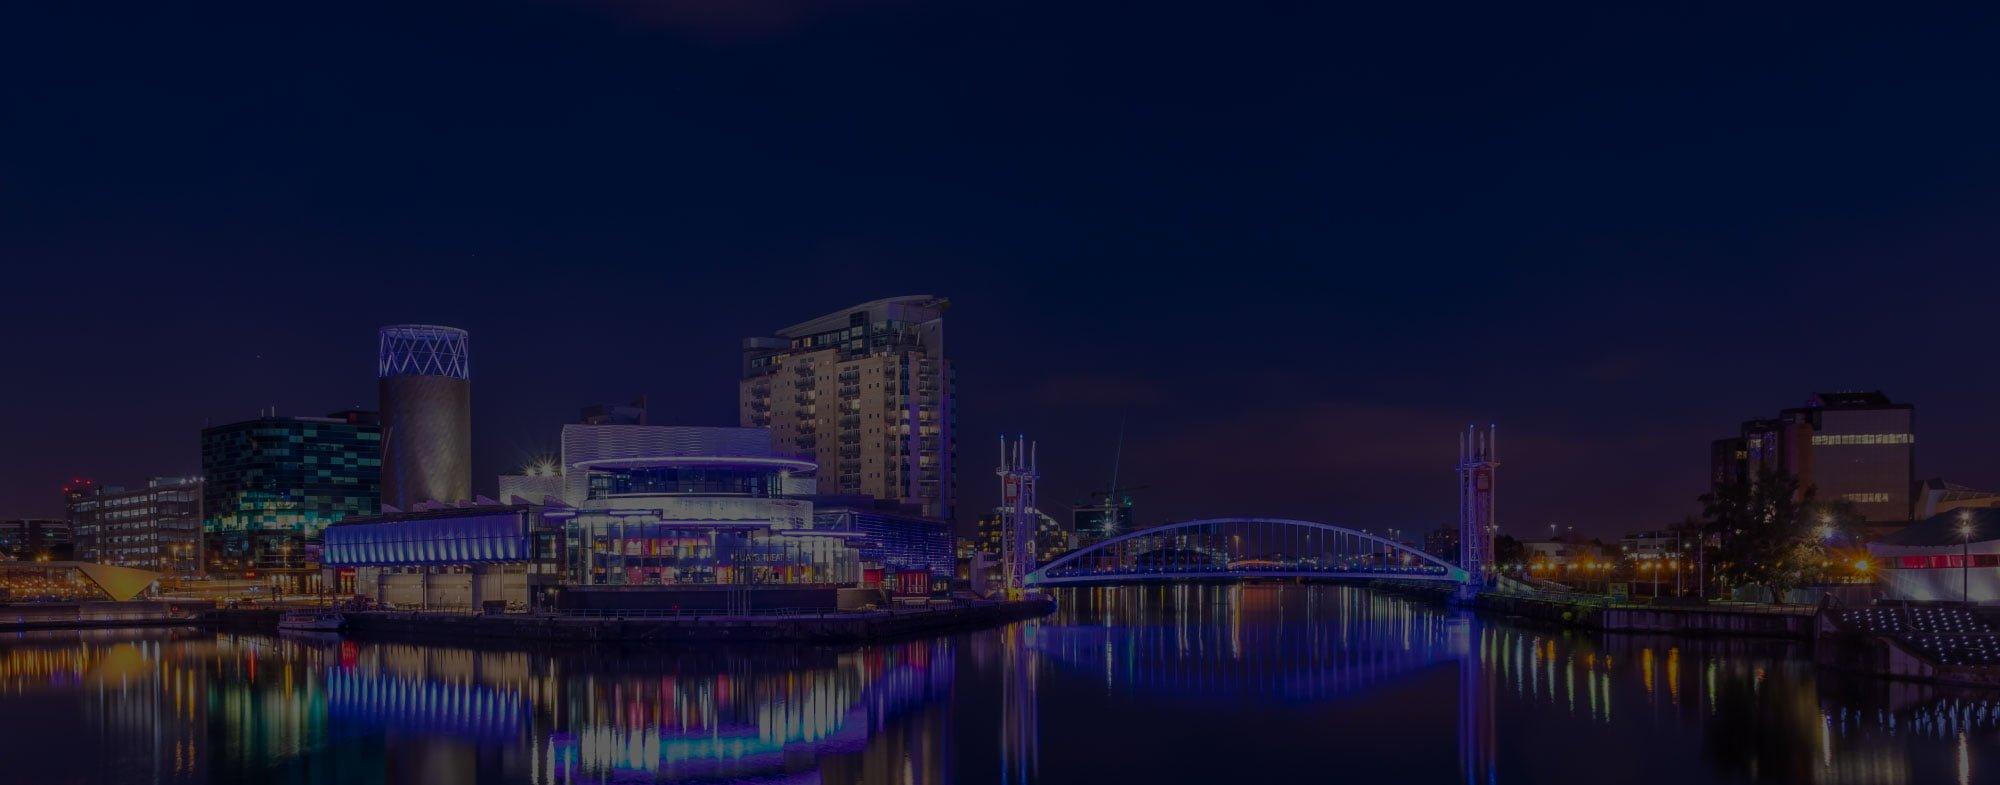 Manchester Property Development